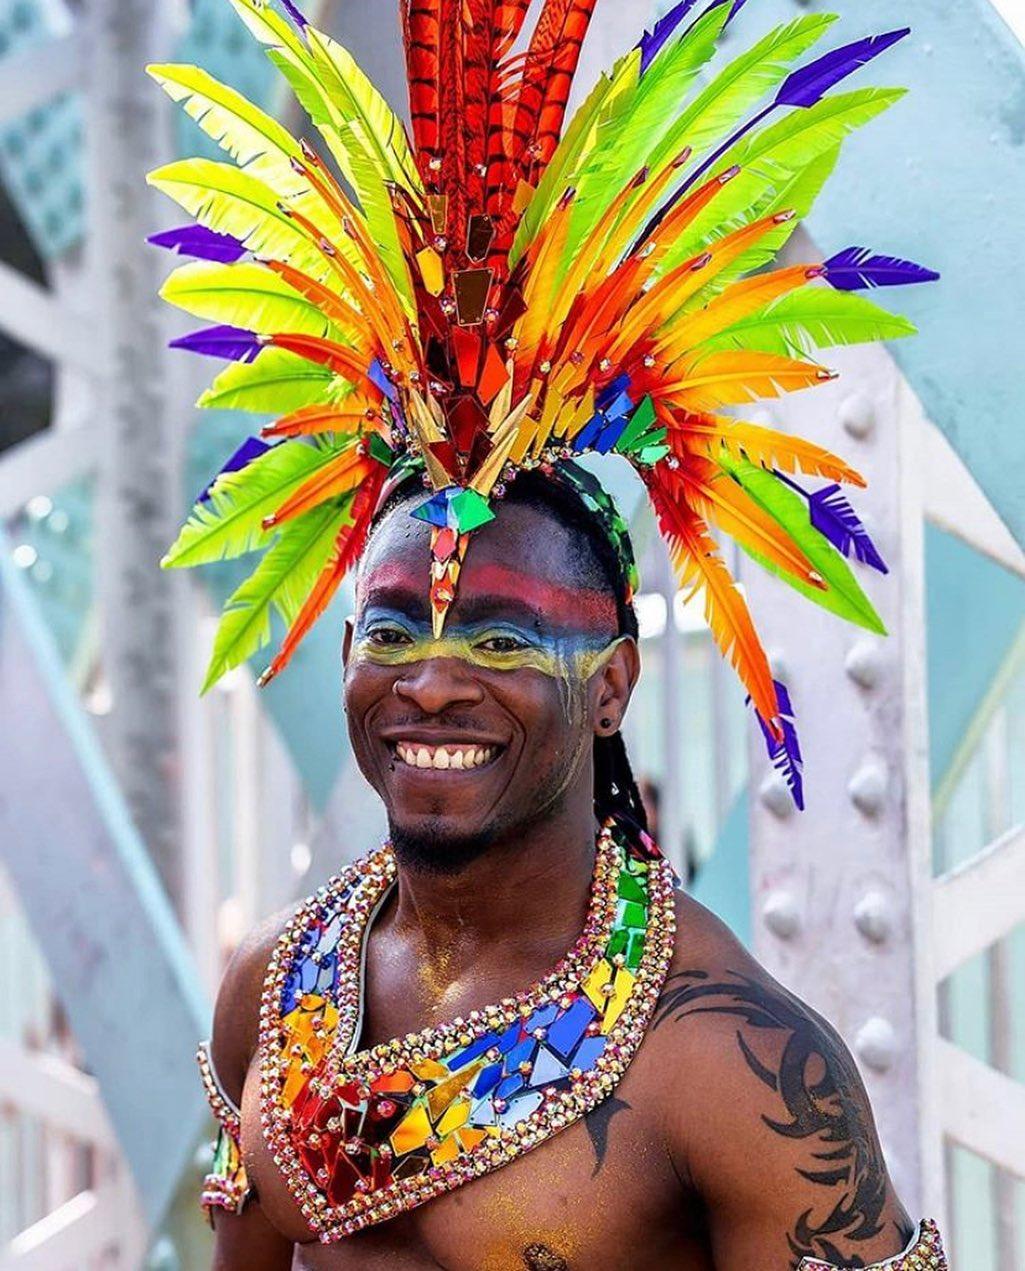 Rainbow Mirror Sequin Color Men's Carnival Costume Choker and Head Wear